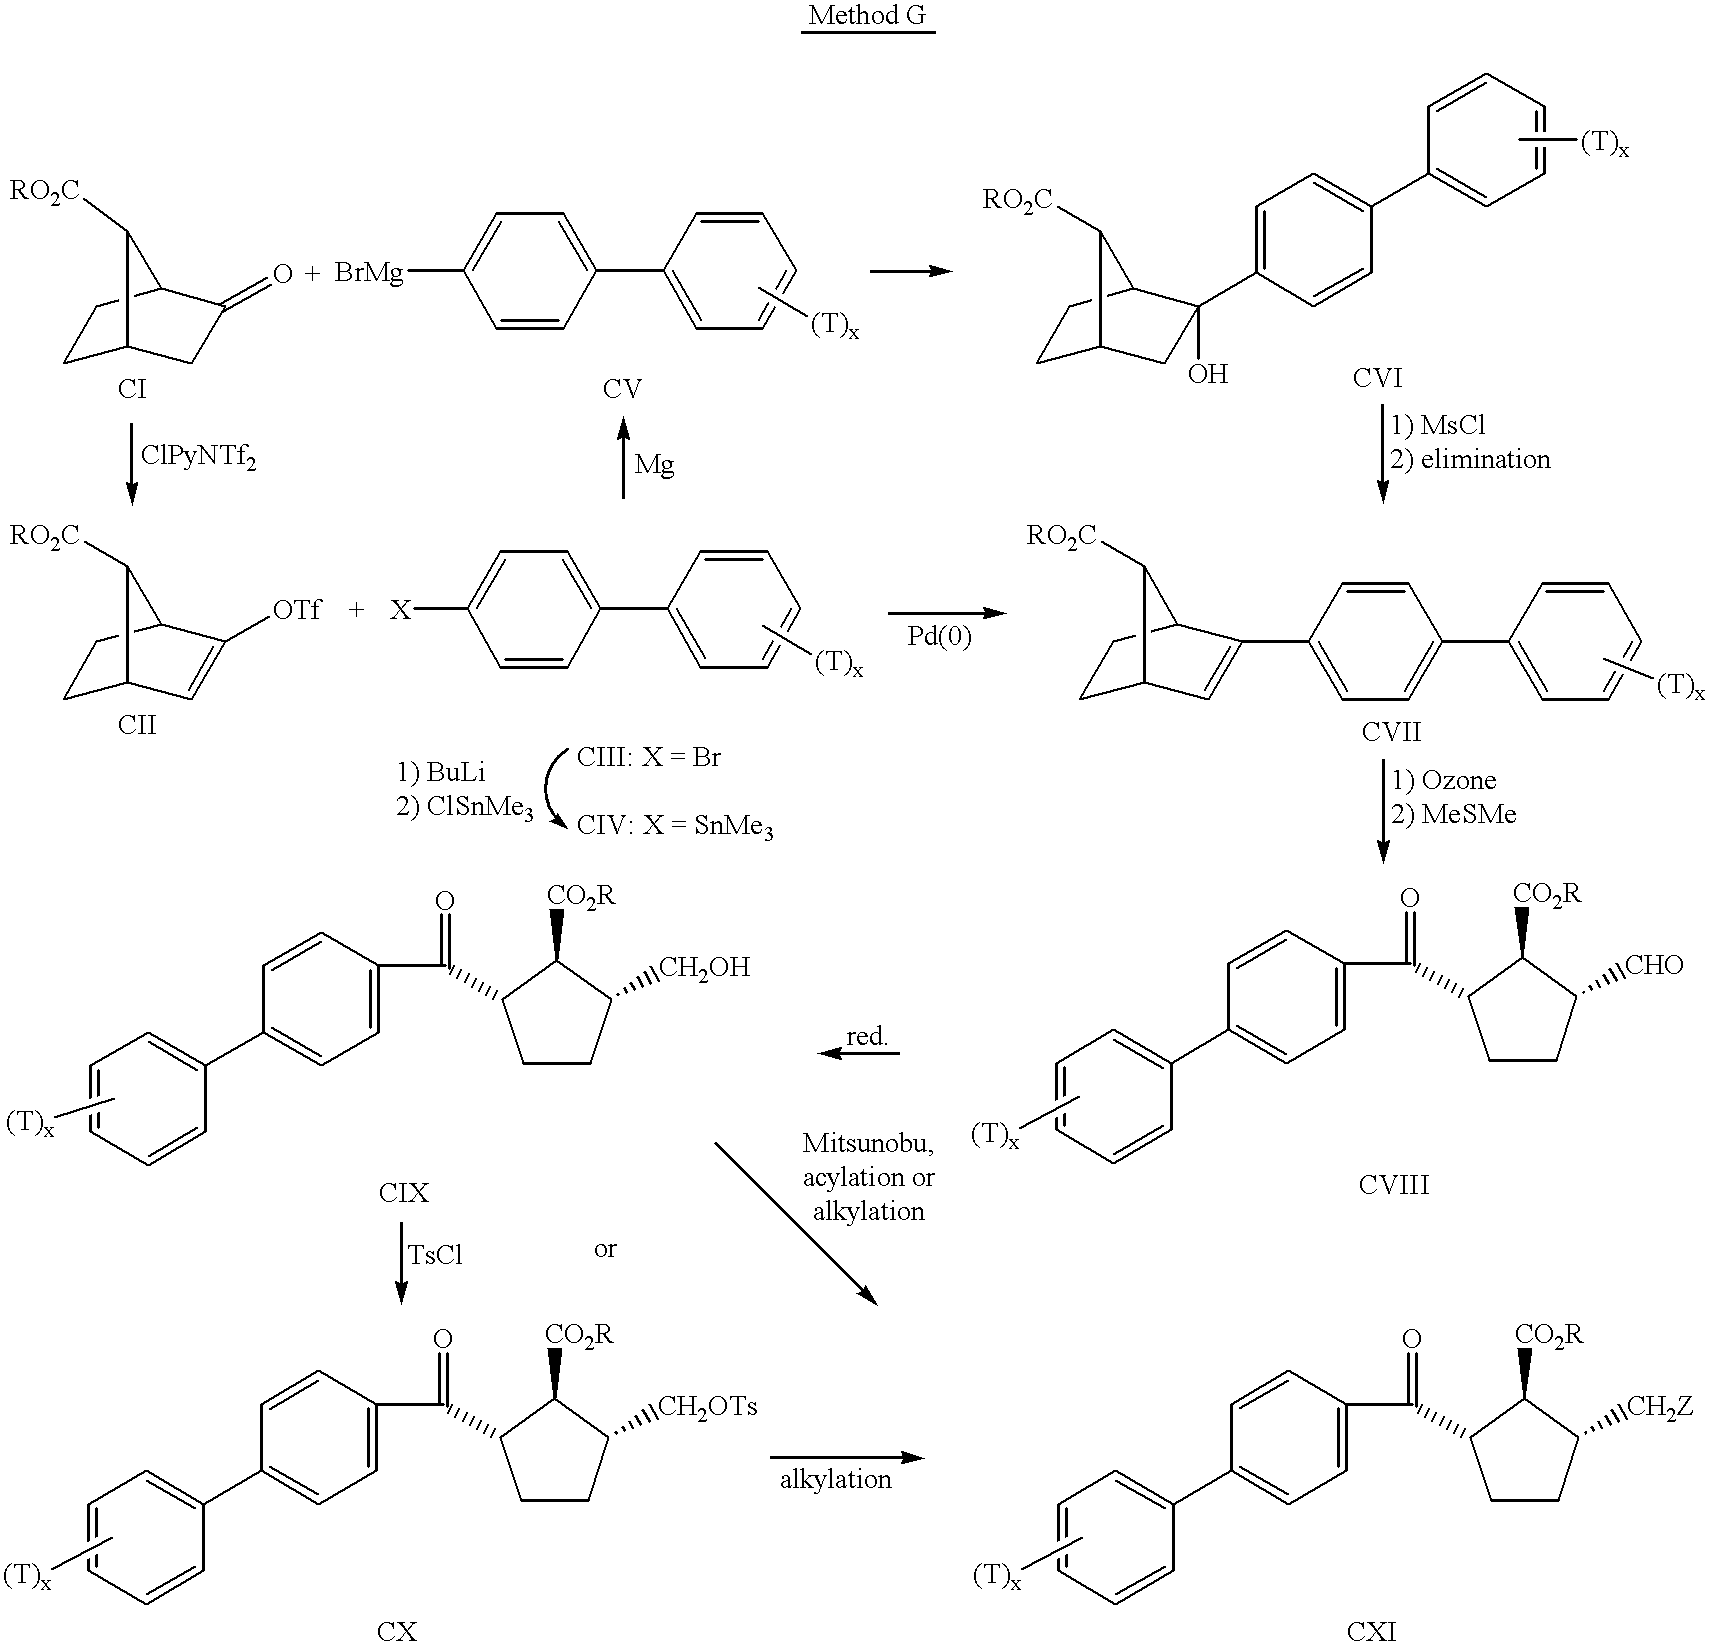 Lewis Dot Diagram For So3